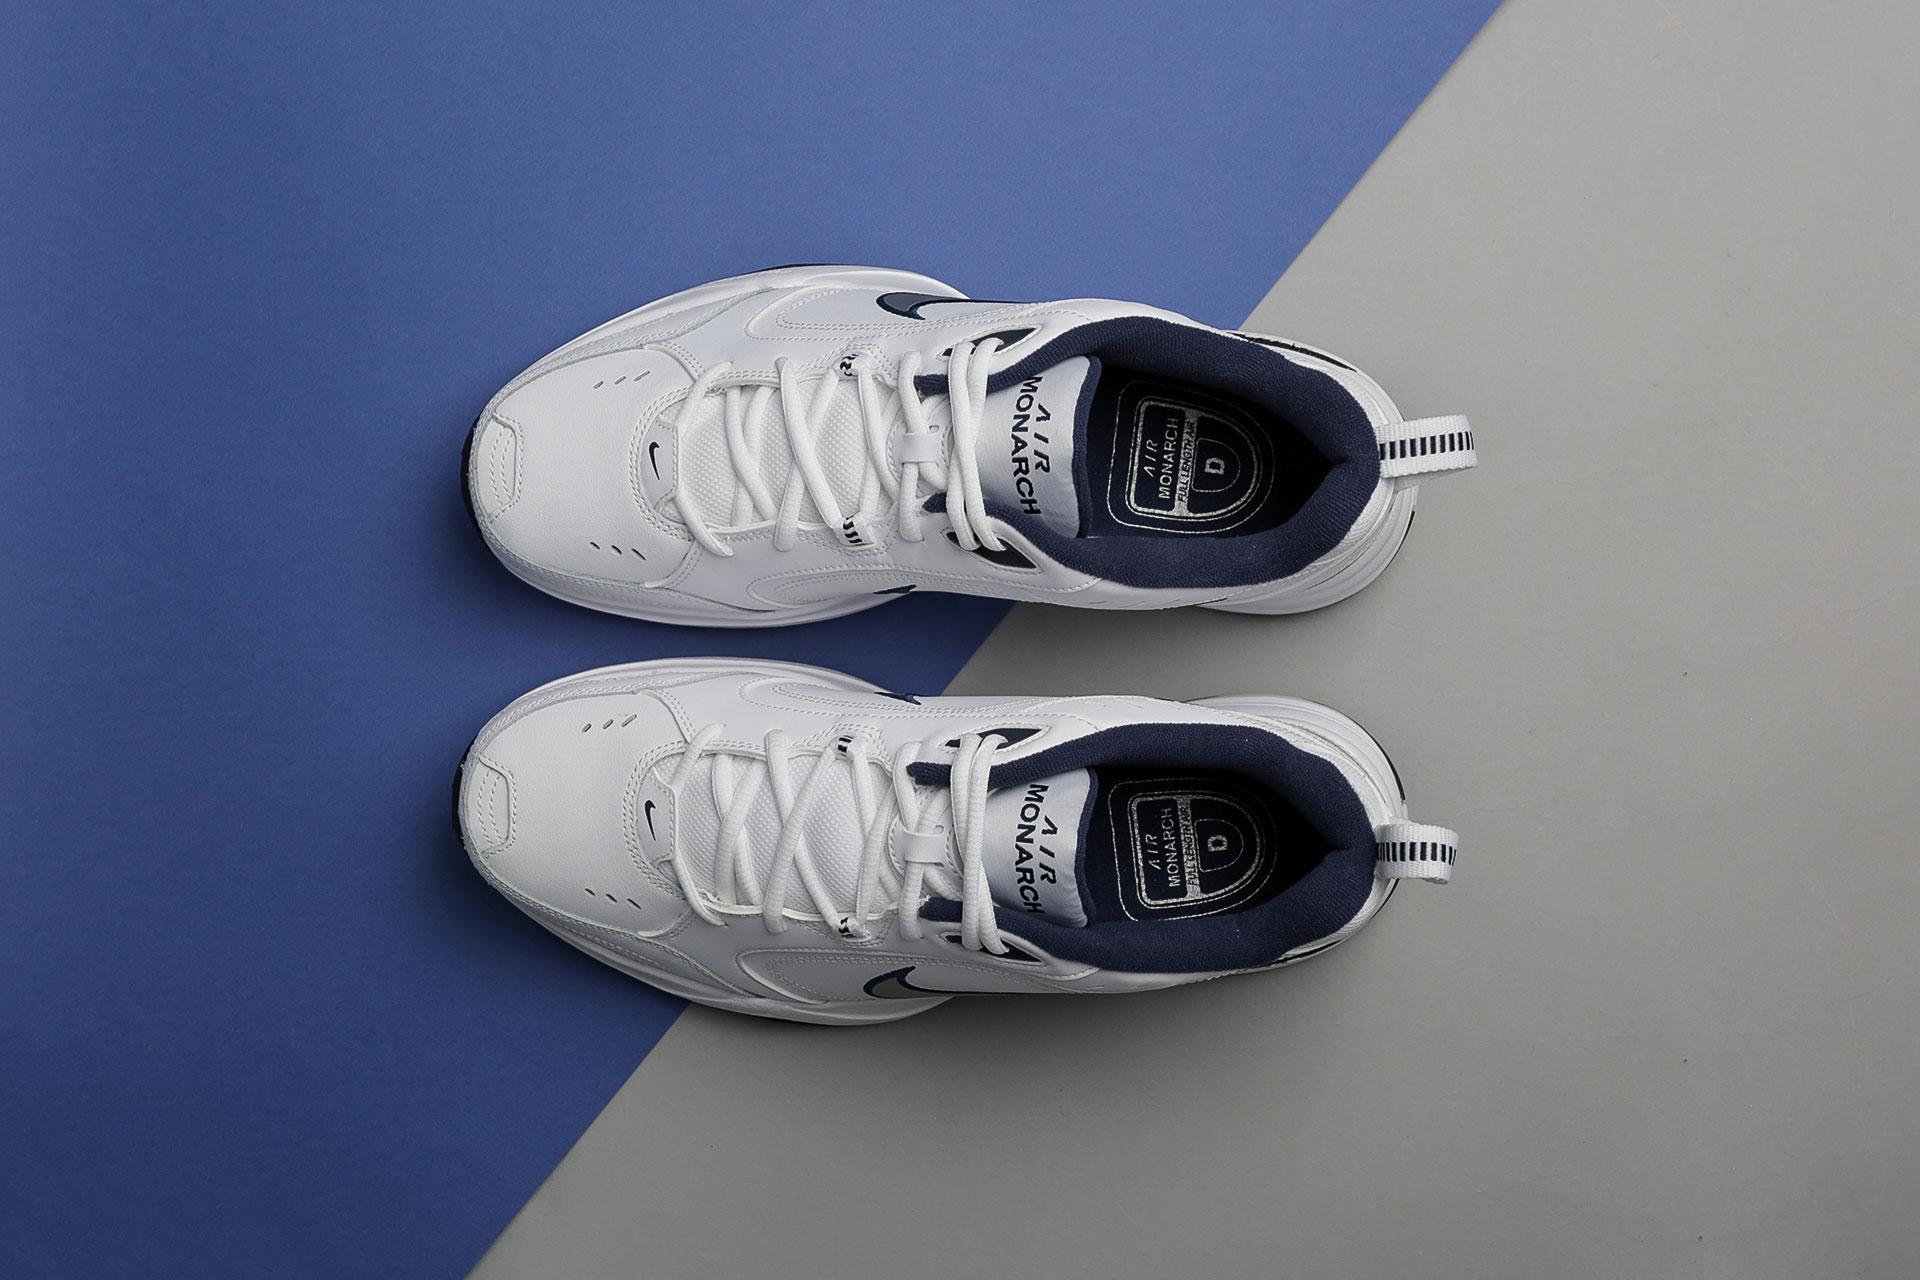 01cfddd9 ... Купить мужские белые кроссовки Nike Air Monarch IV - фото 2 картинки ...